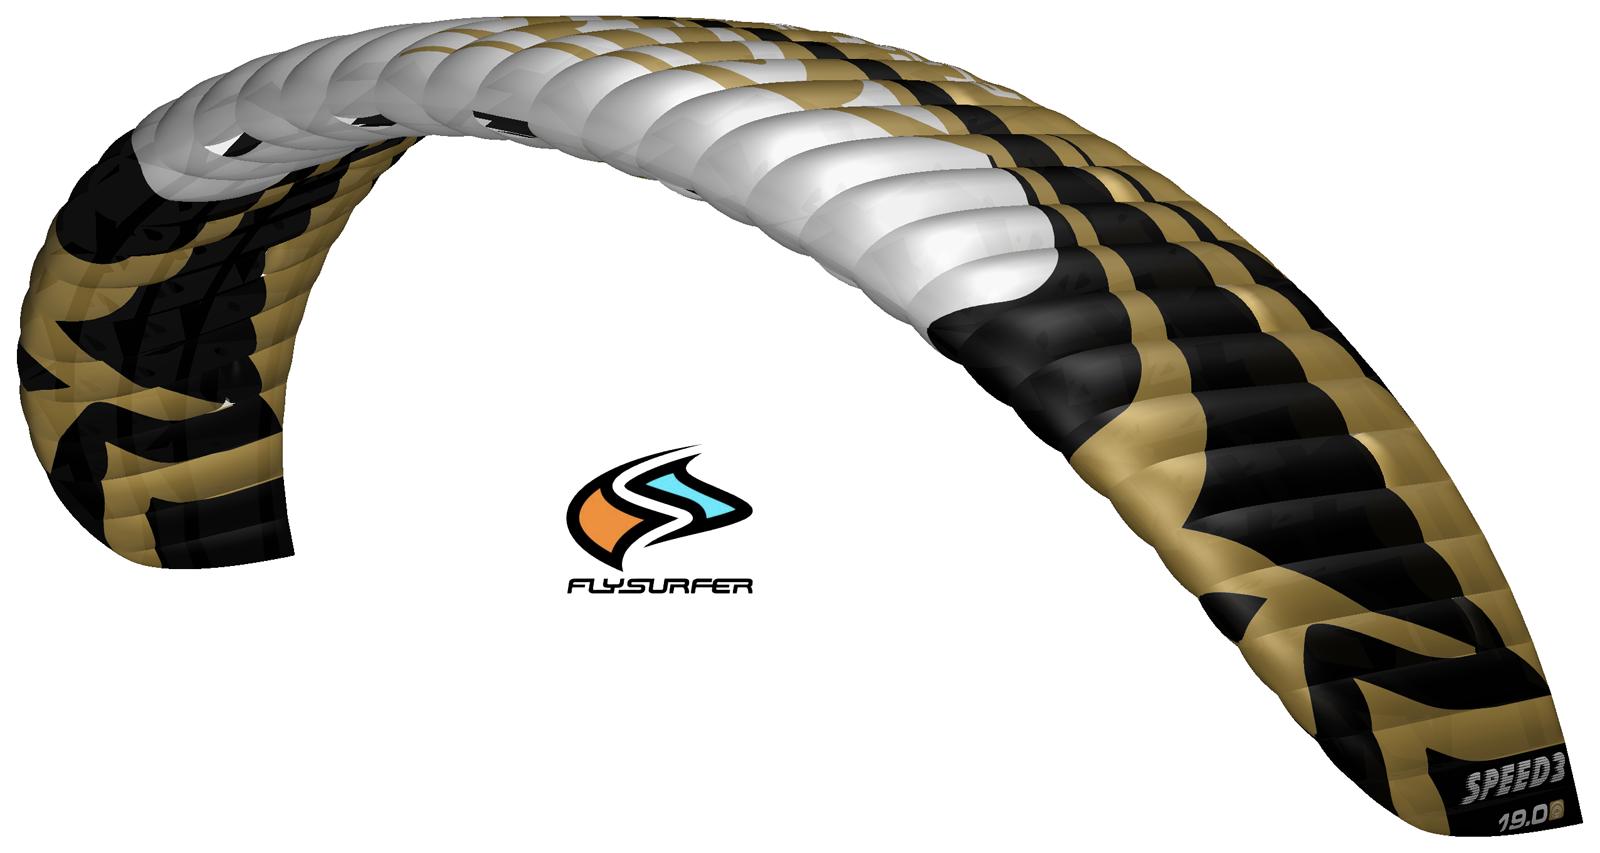 Matériel : Flysurfer Speed3 Deluxe Edition